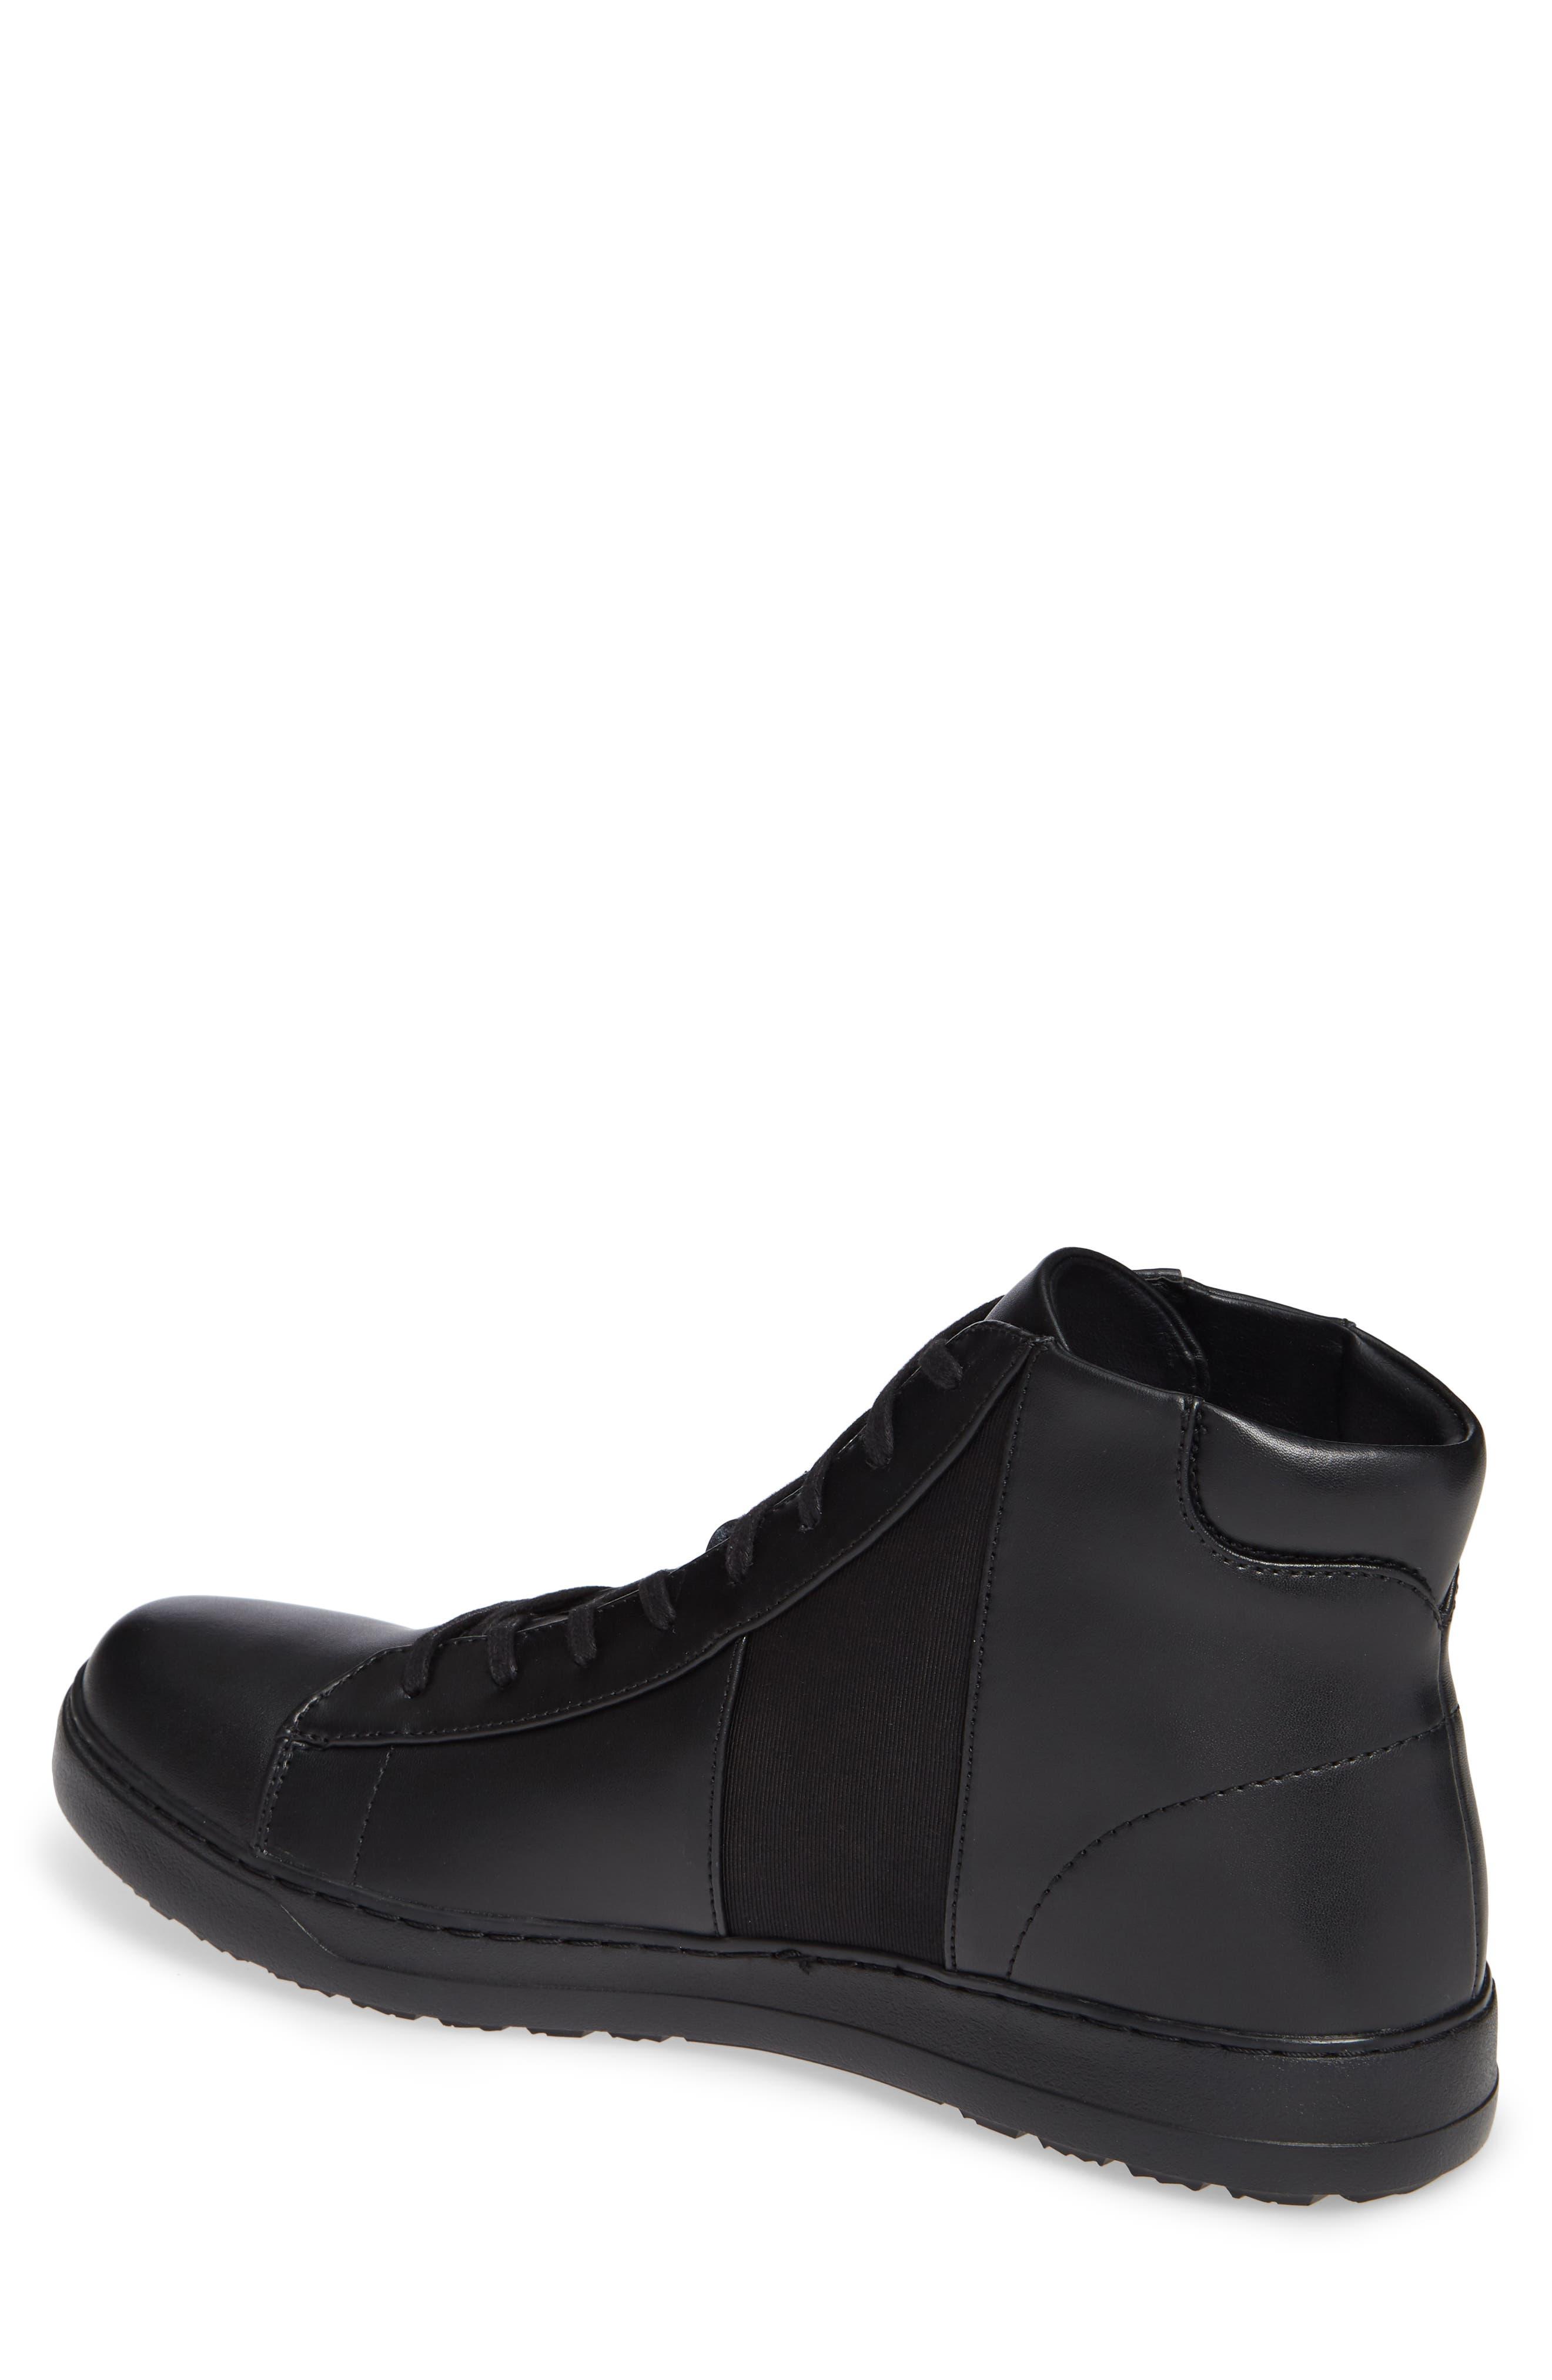 Salvador High Top Sneaker,                             Alternate thumbnail 2, color,                             BLACK/ BLACK LEATHER